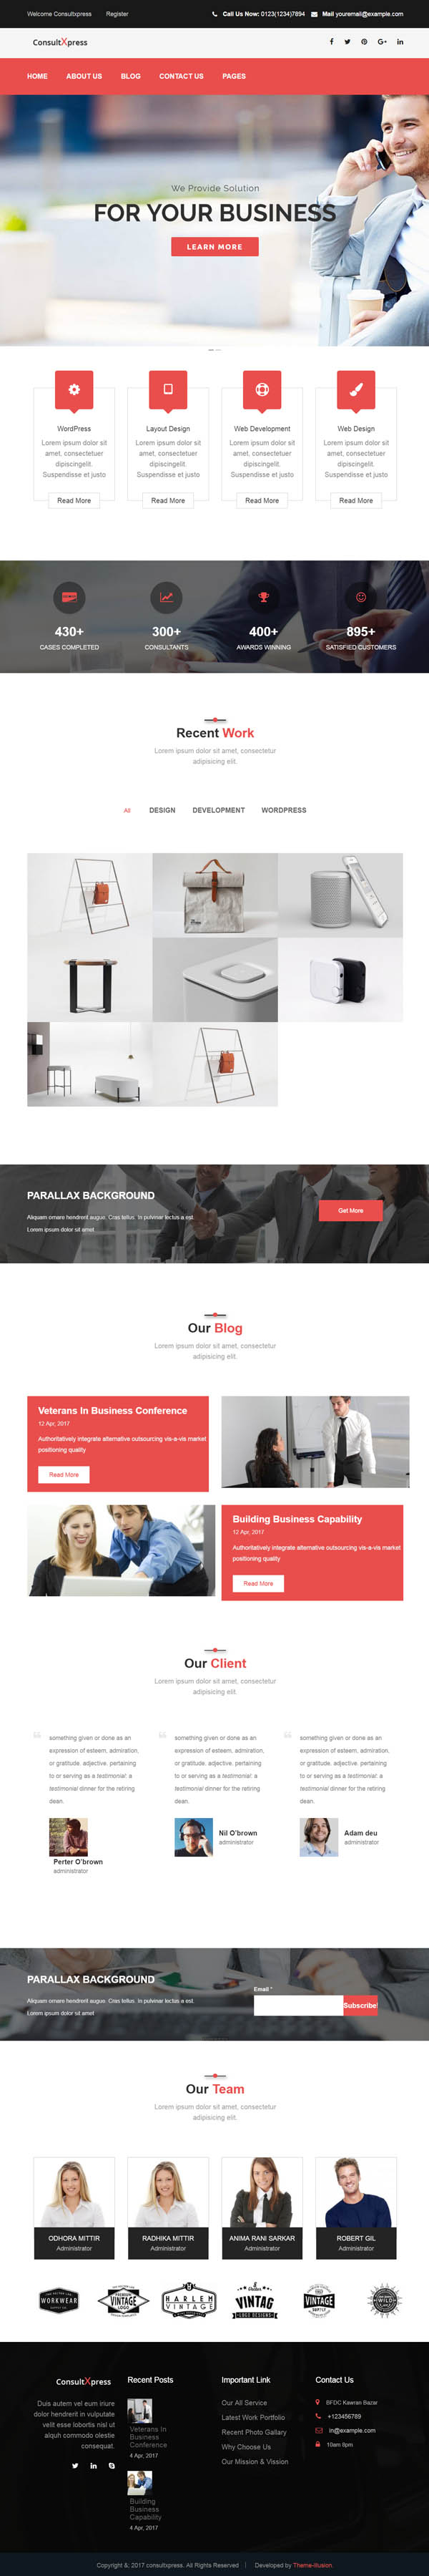 Consultxpress - Multipurpose Business WordPress Theme